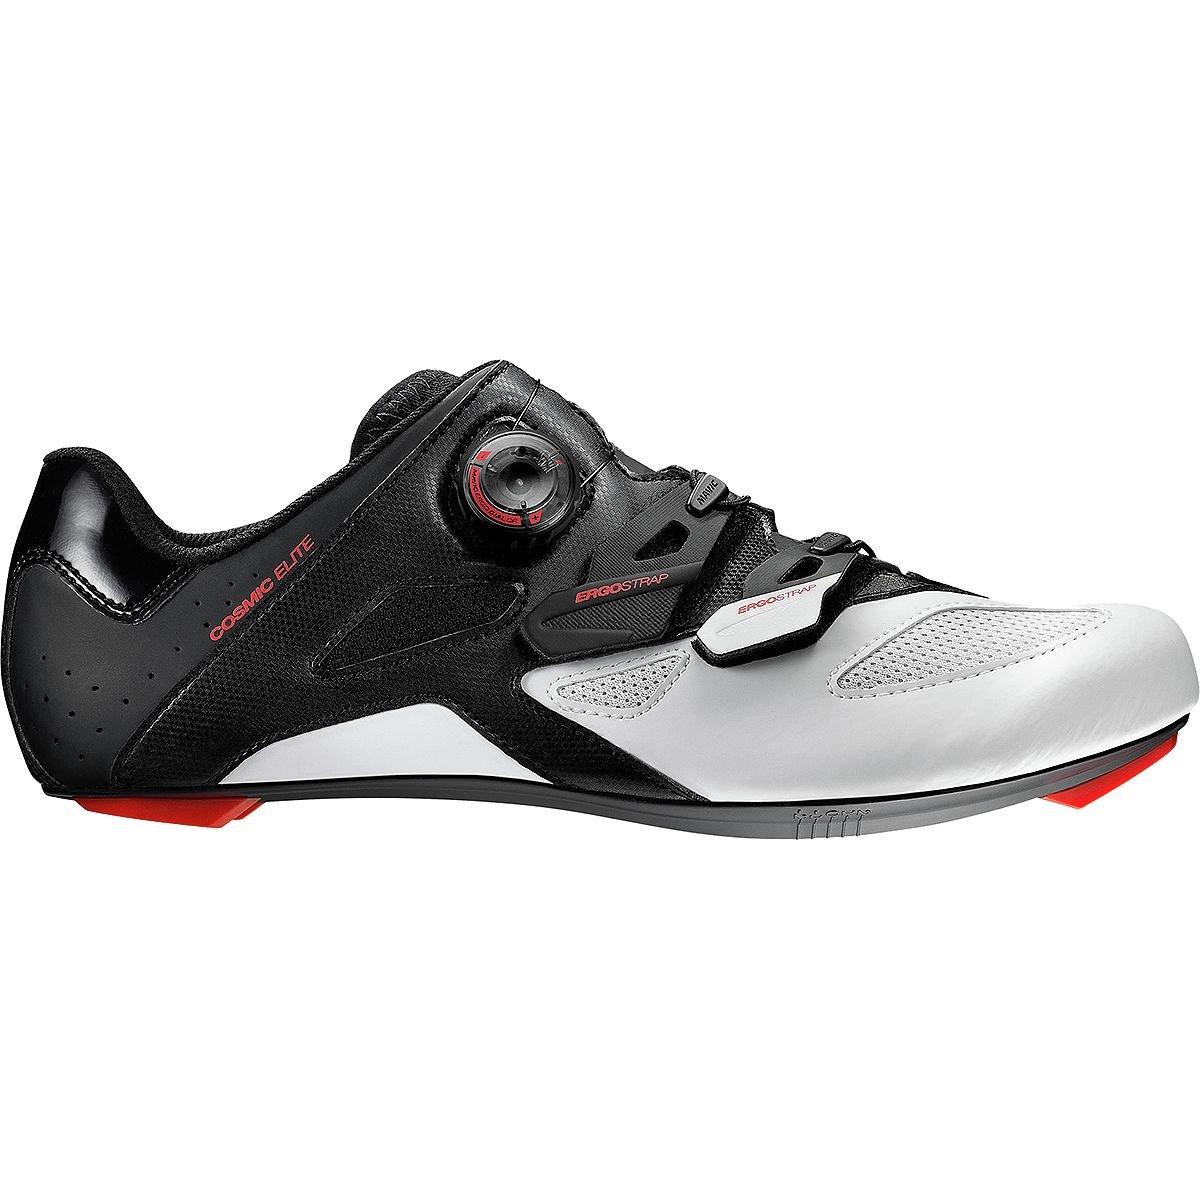 Mavic Cosmic Elite Cycling Shoes – Men 's B01M0U4T0Y 10 D(M) US Black/White/Fiery Red